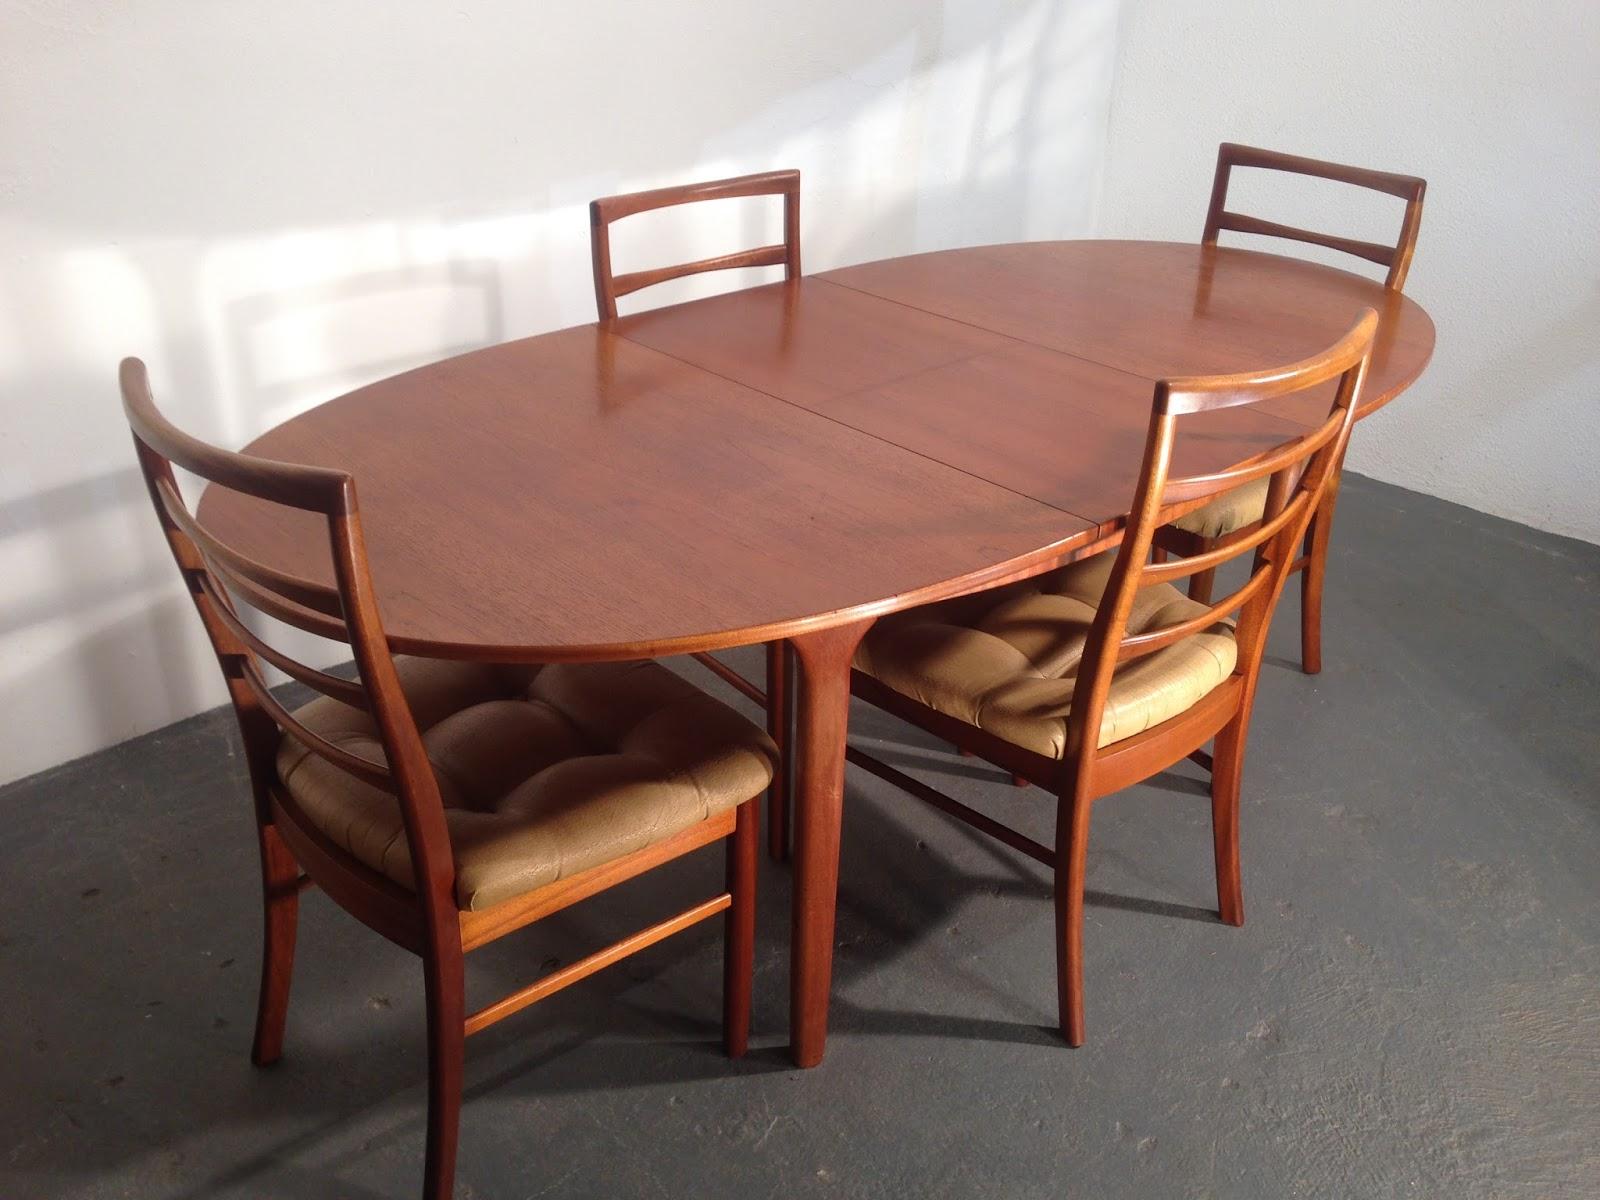 retro dining chairs ireland chair bed sleeper ikea ocd vintage furniture mcintosh set